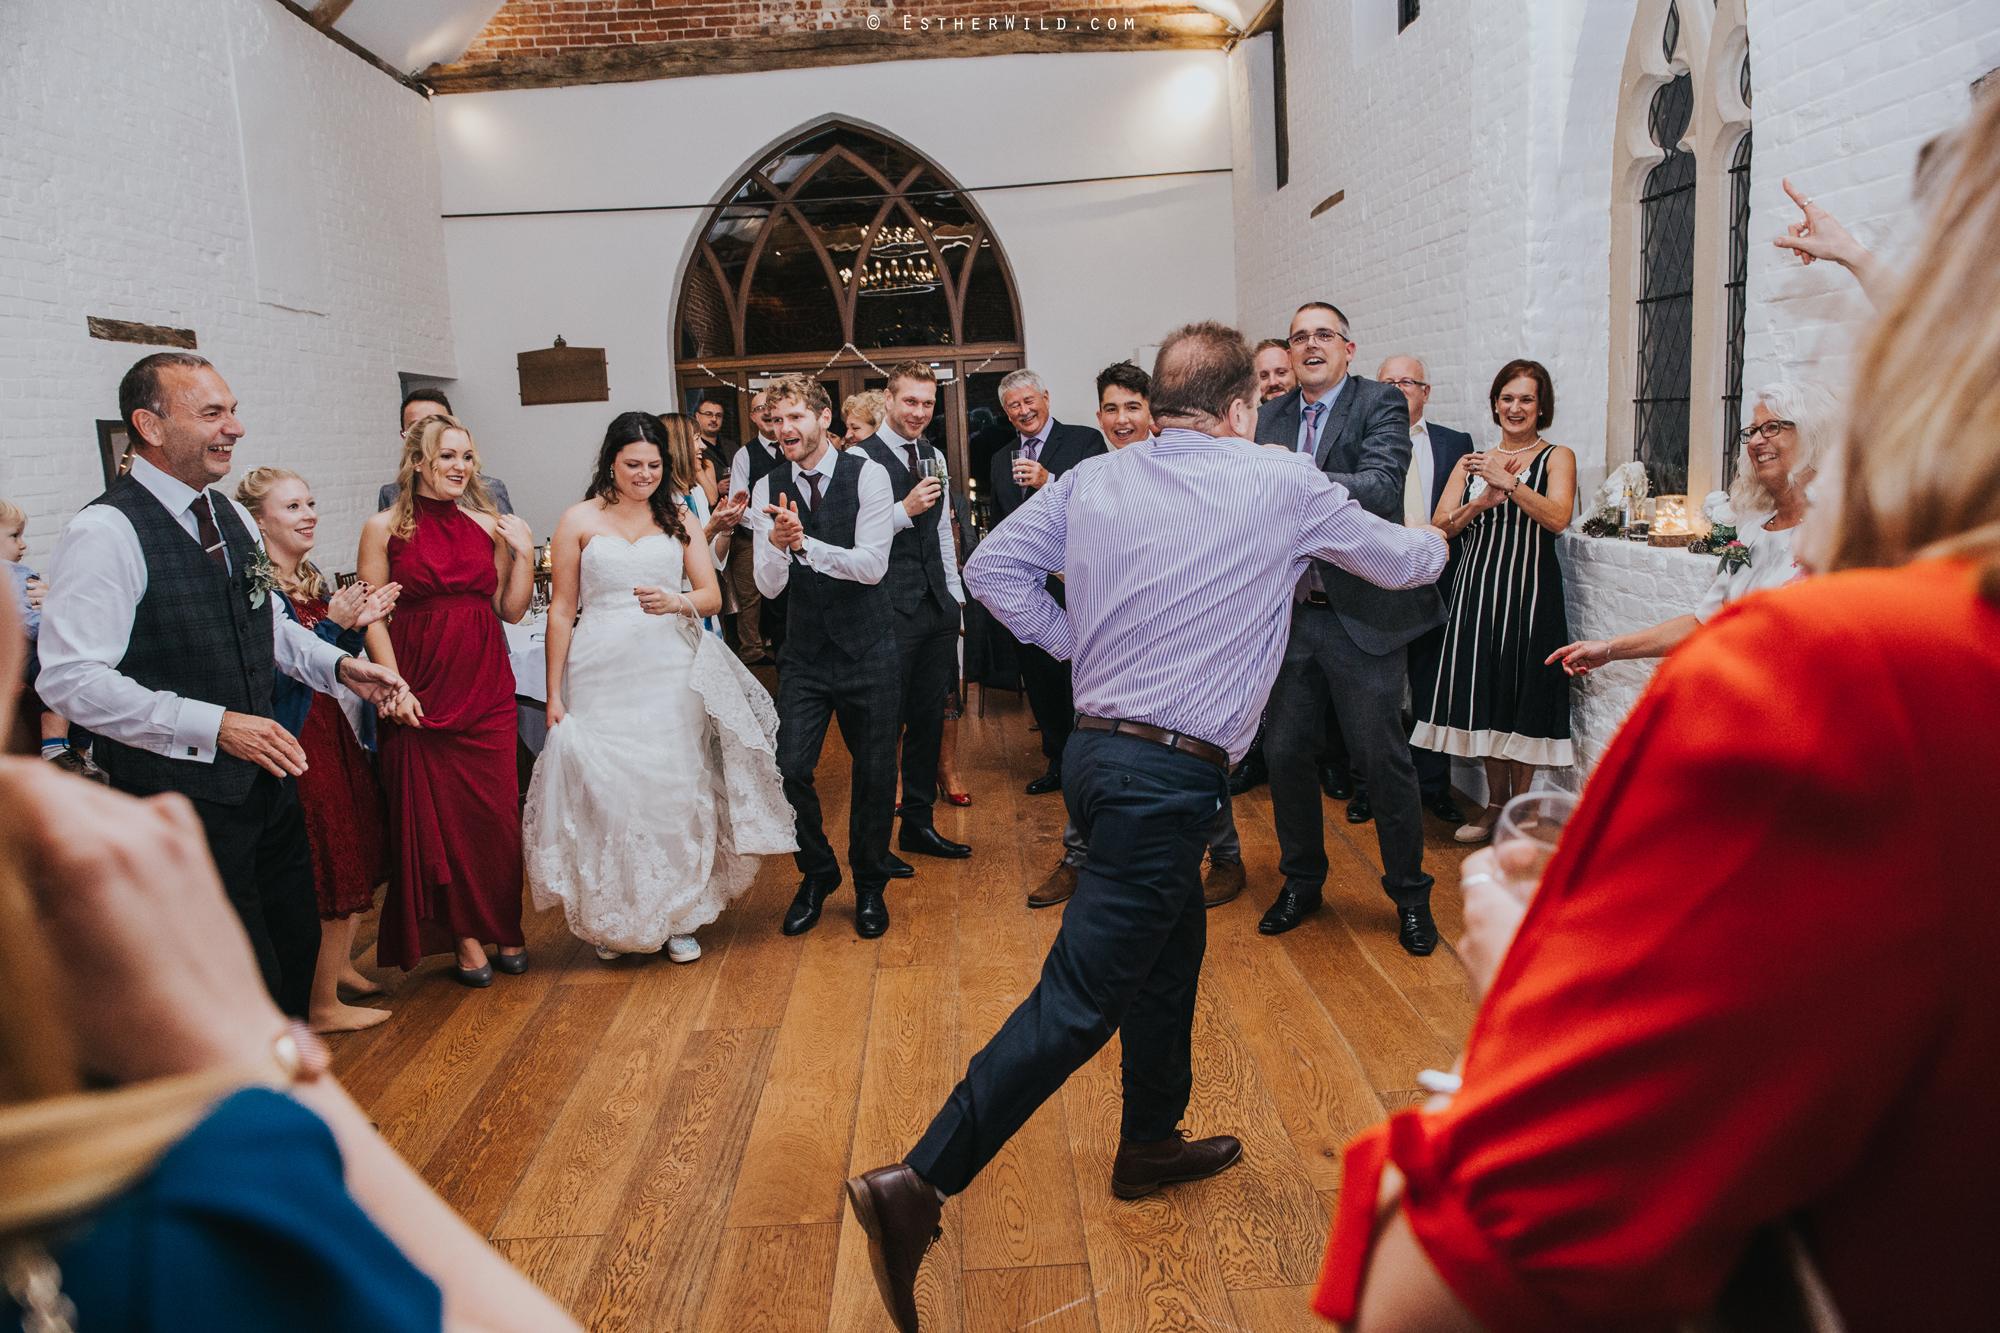 1017_Reading_Room_Weddings_Alby_Norwich_Photographer_Esther_Wild_IMG_3951.jpg